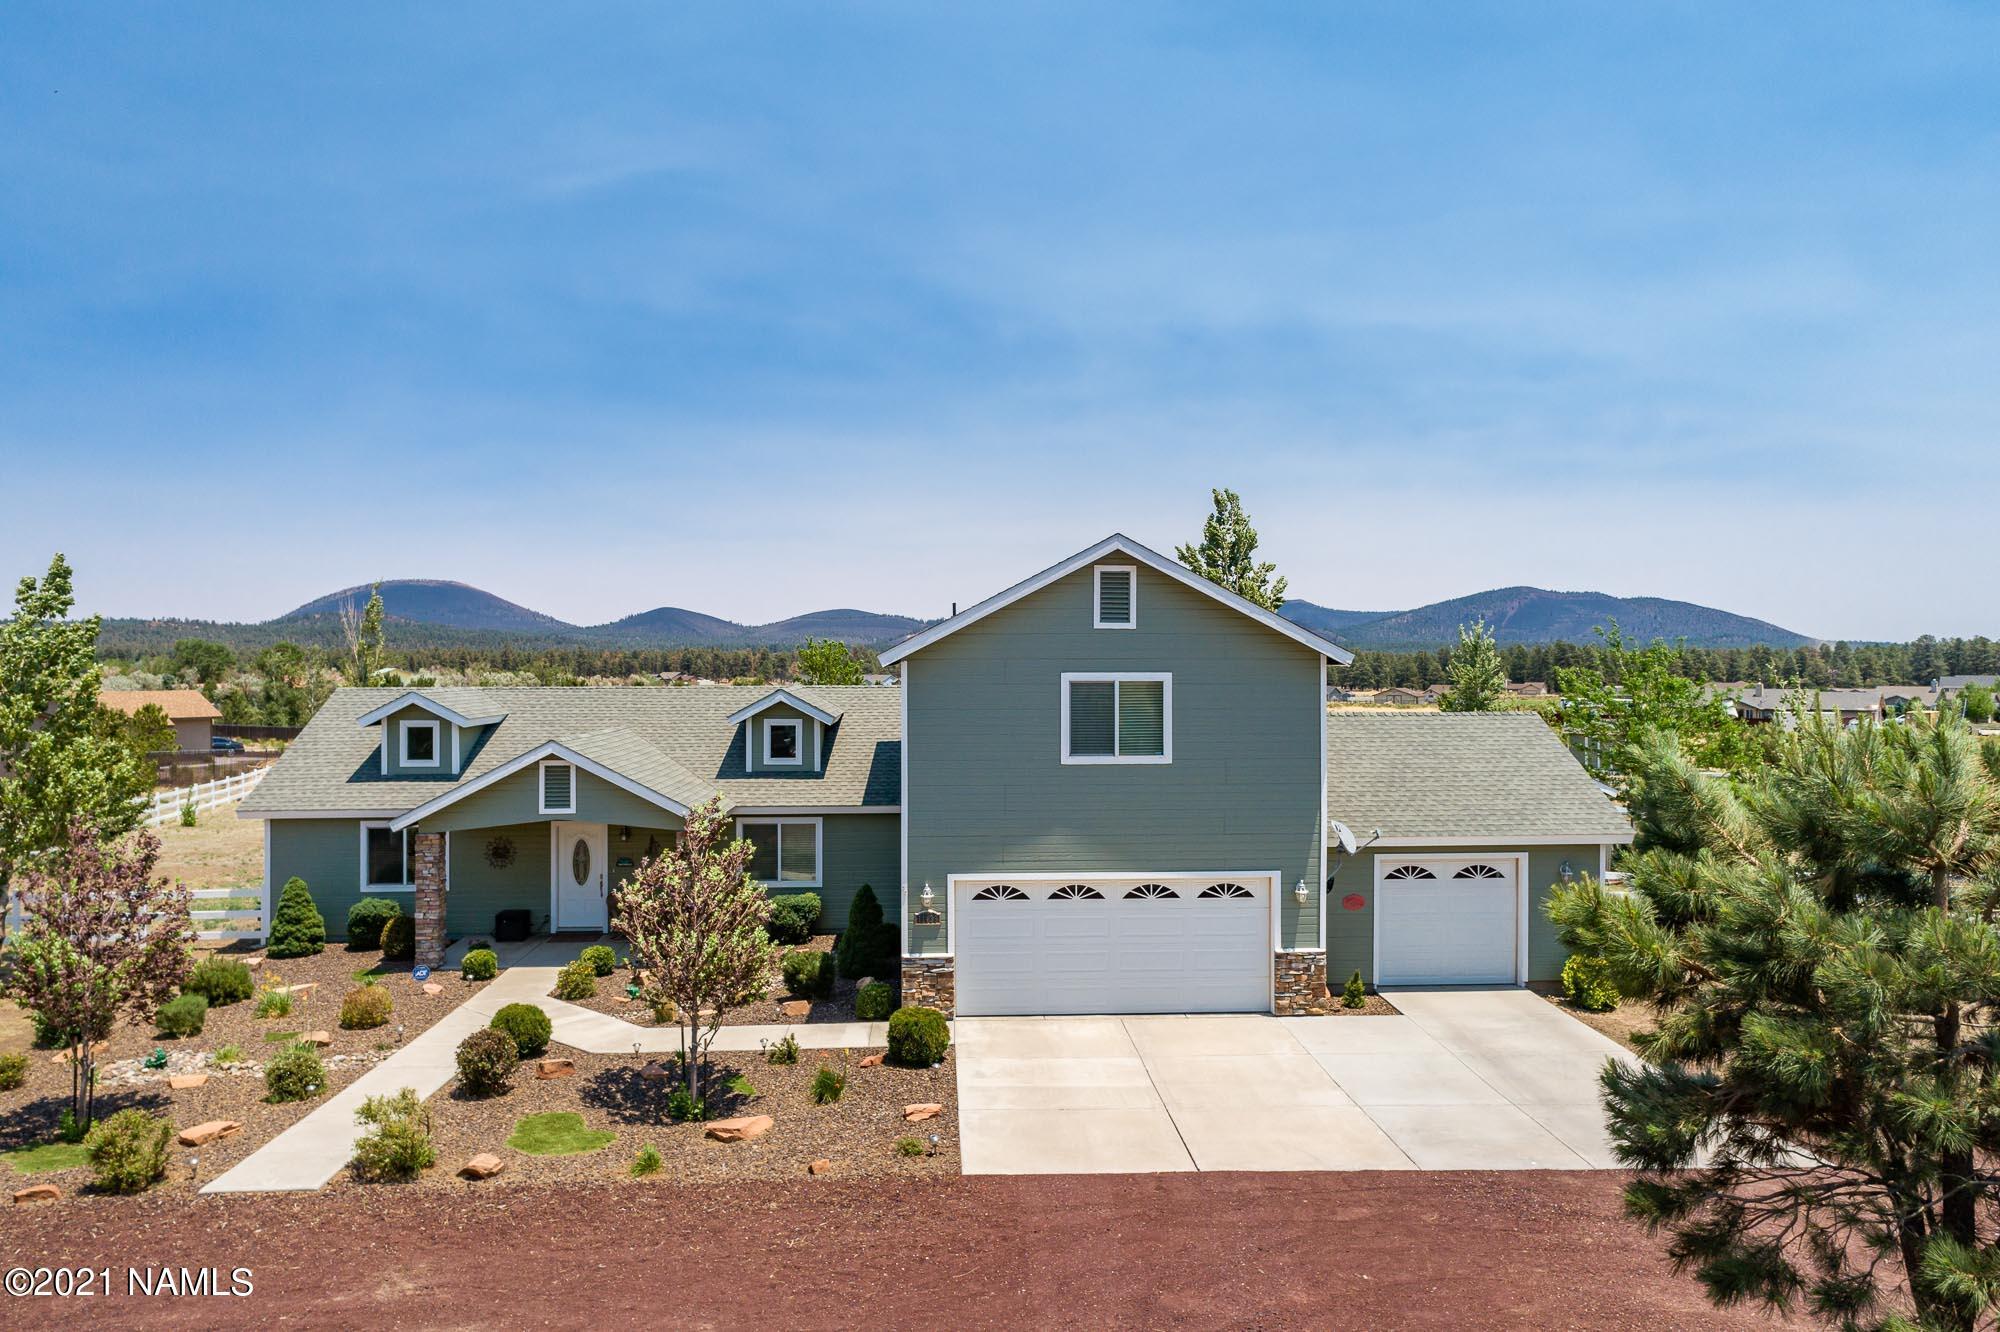 Photo of 11439 N Soaring Eagle Drive, Flagstaff, AZ 86004